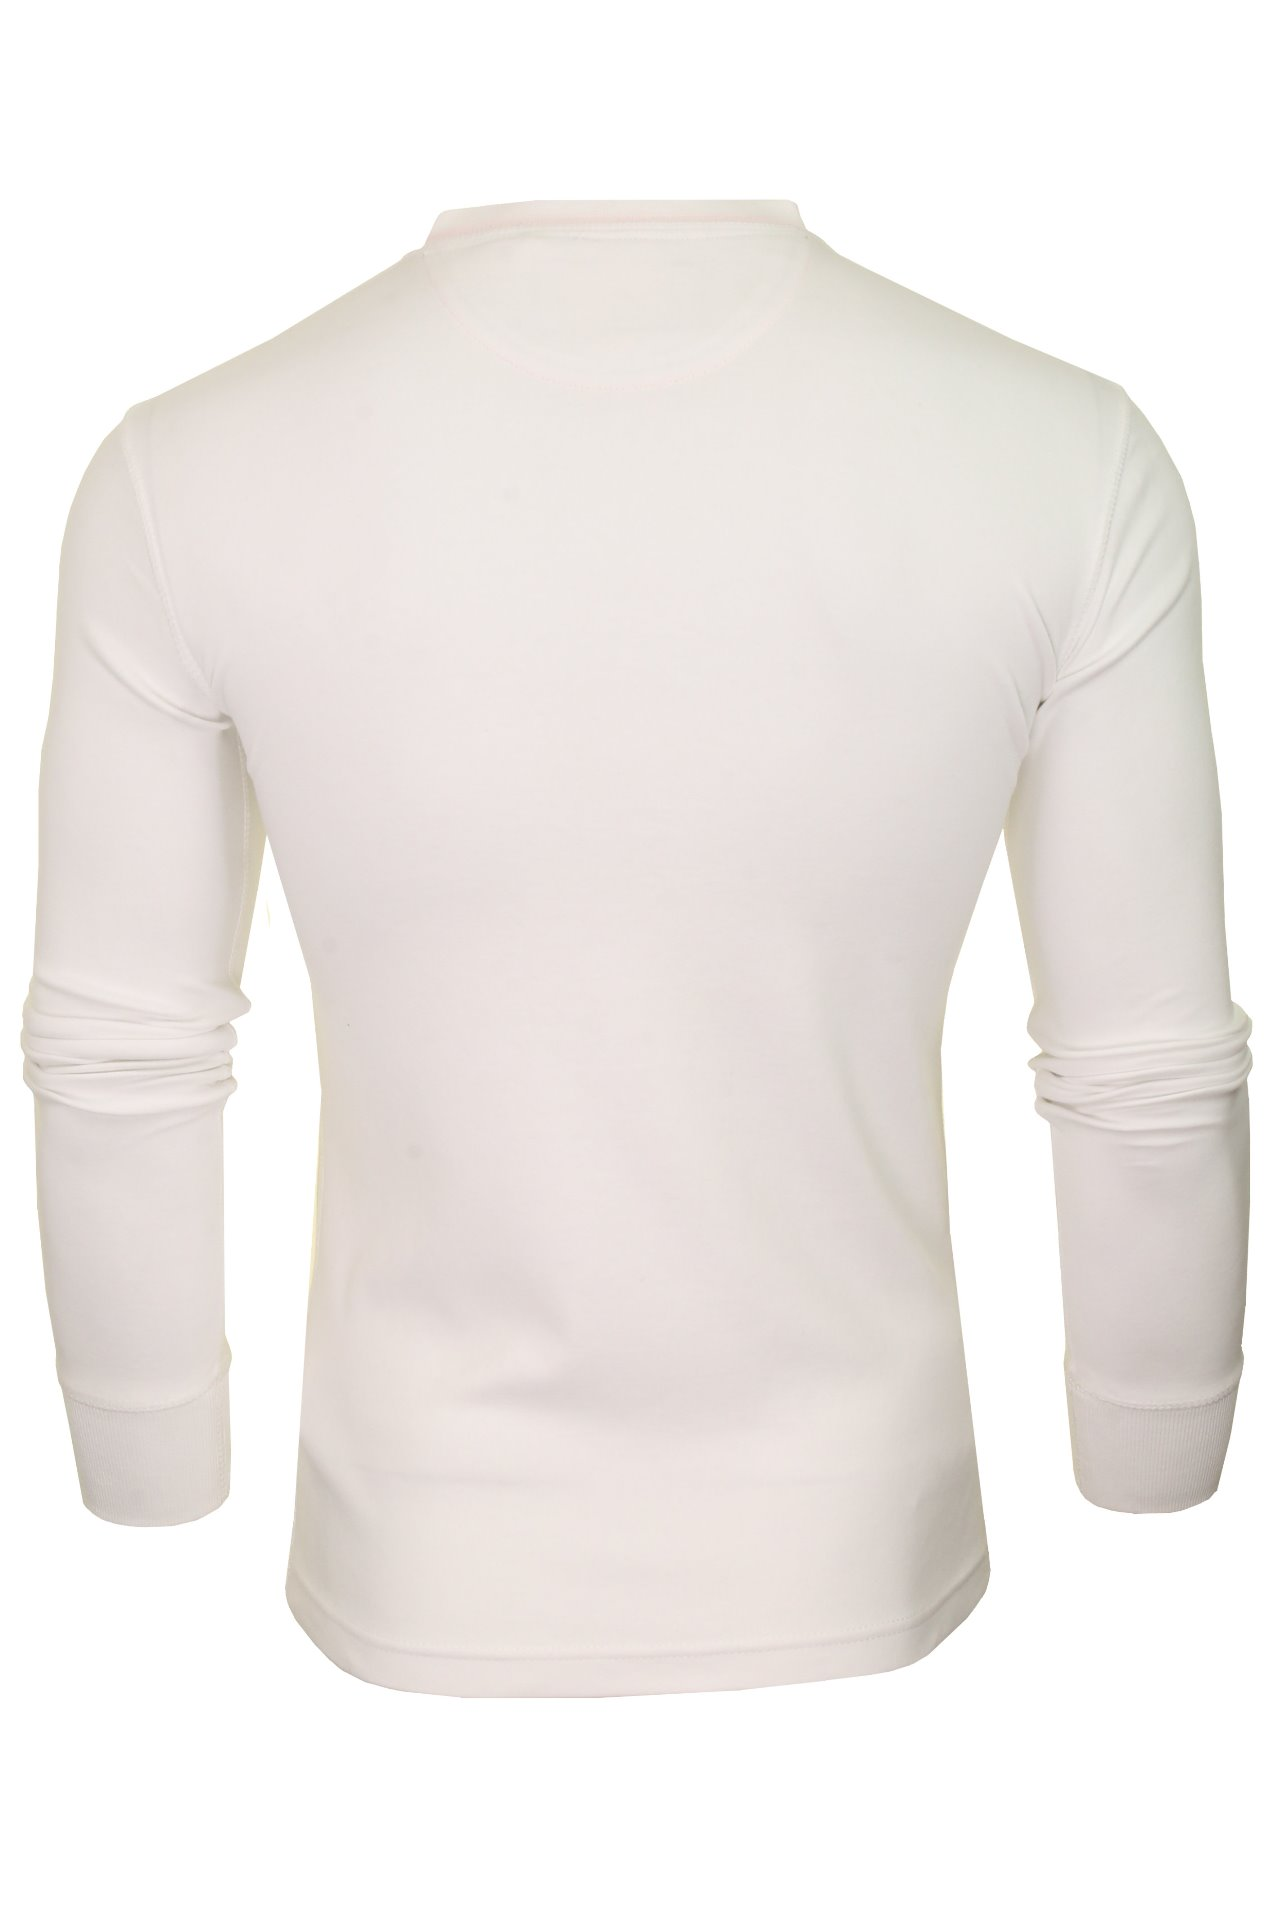 Camisa-de-manga-larga-patrimonio-039-039-Abuelo-T-Shirt miniatura 8